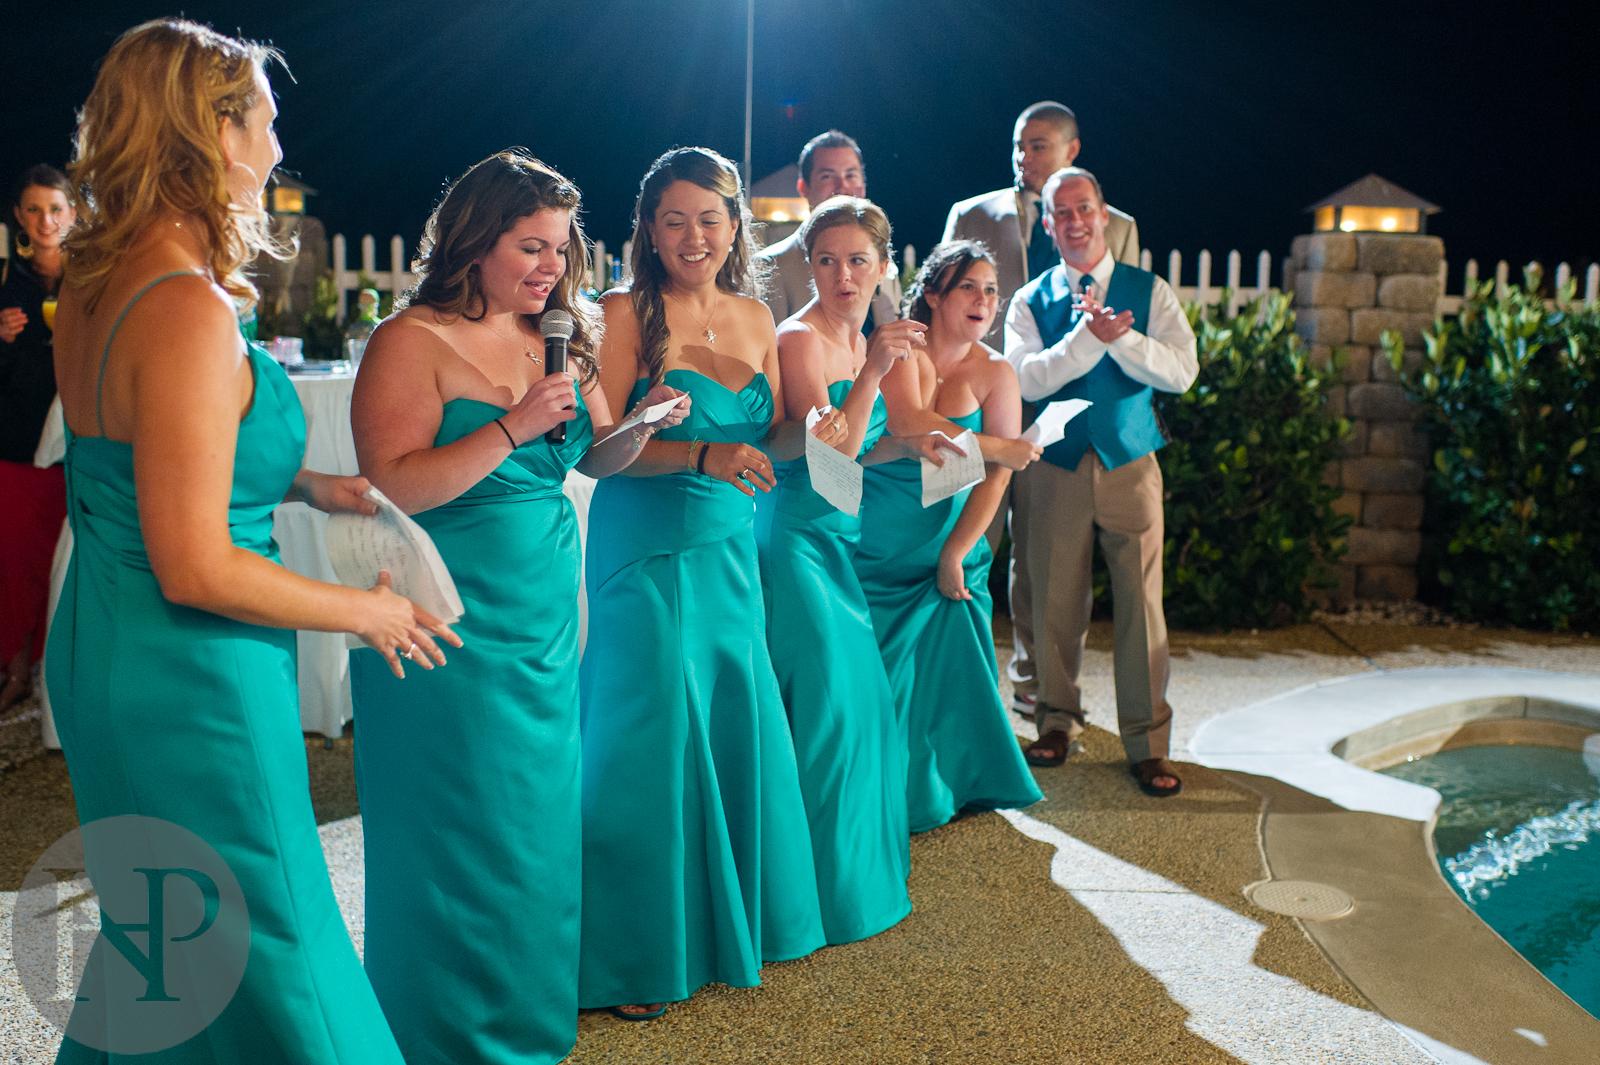 wedding photography dc photographer - district of columbia photography weddingphoto 2012_ denis kaleigh - north carolina - emerald isle - destination wedding-70.jpg